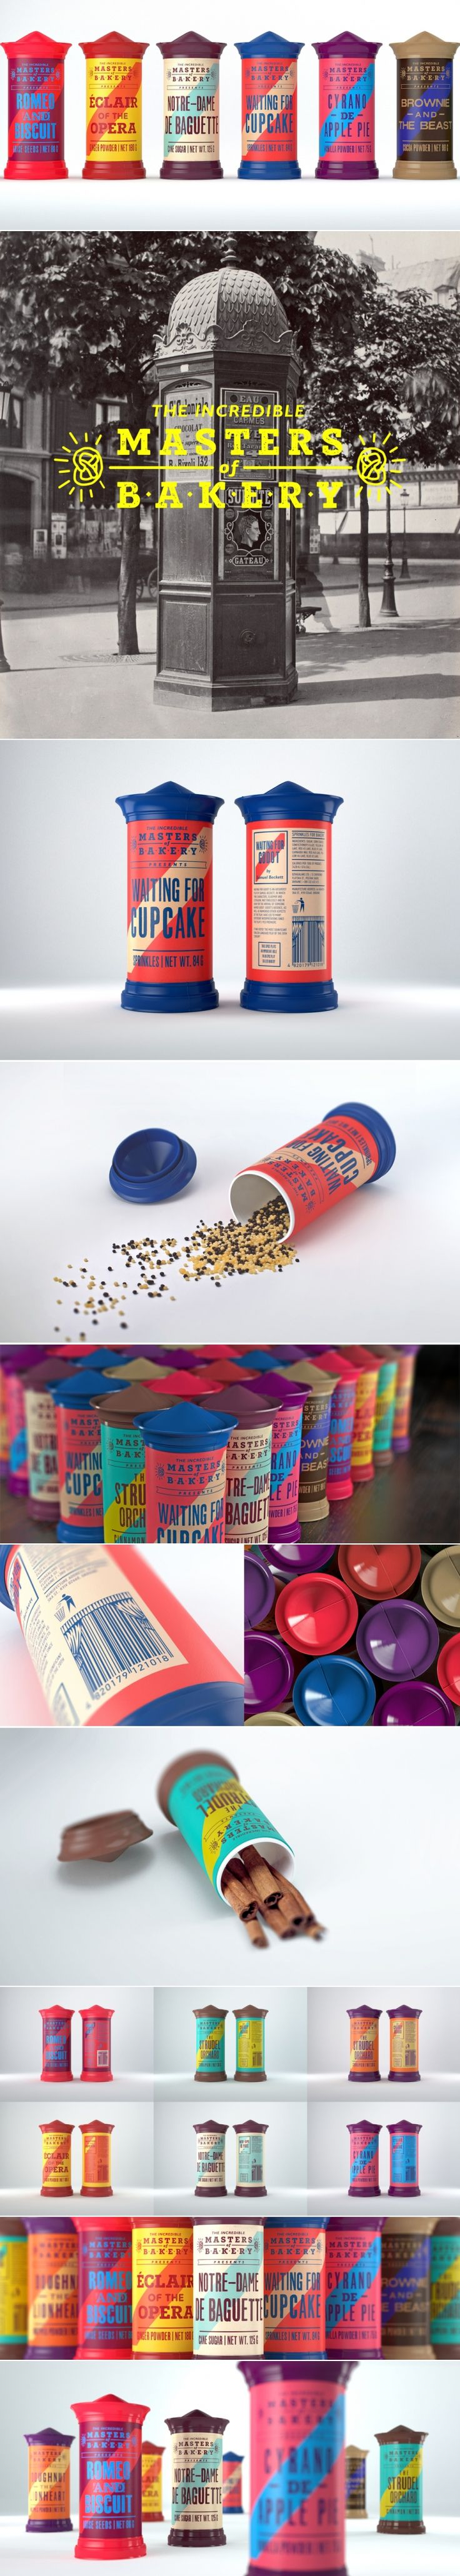 Masters of Bakery: Gift Bakery Spice Set — The Dieline | Packaging & Branding Design & Innovation News